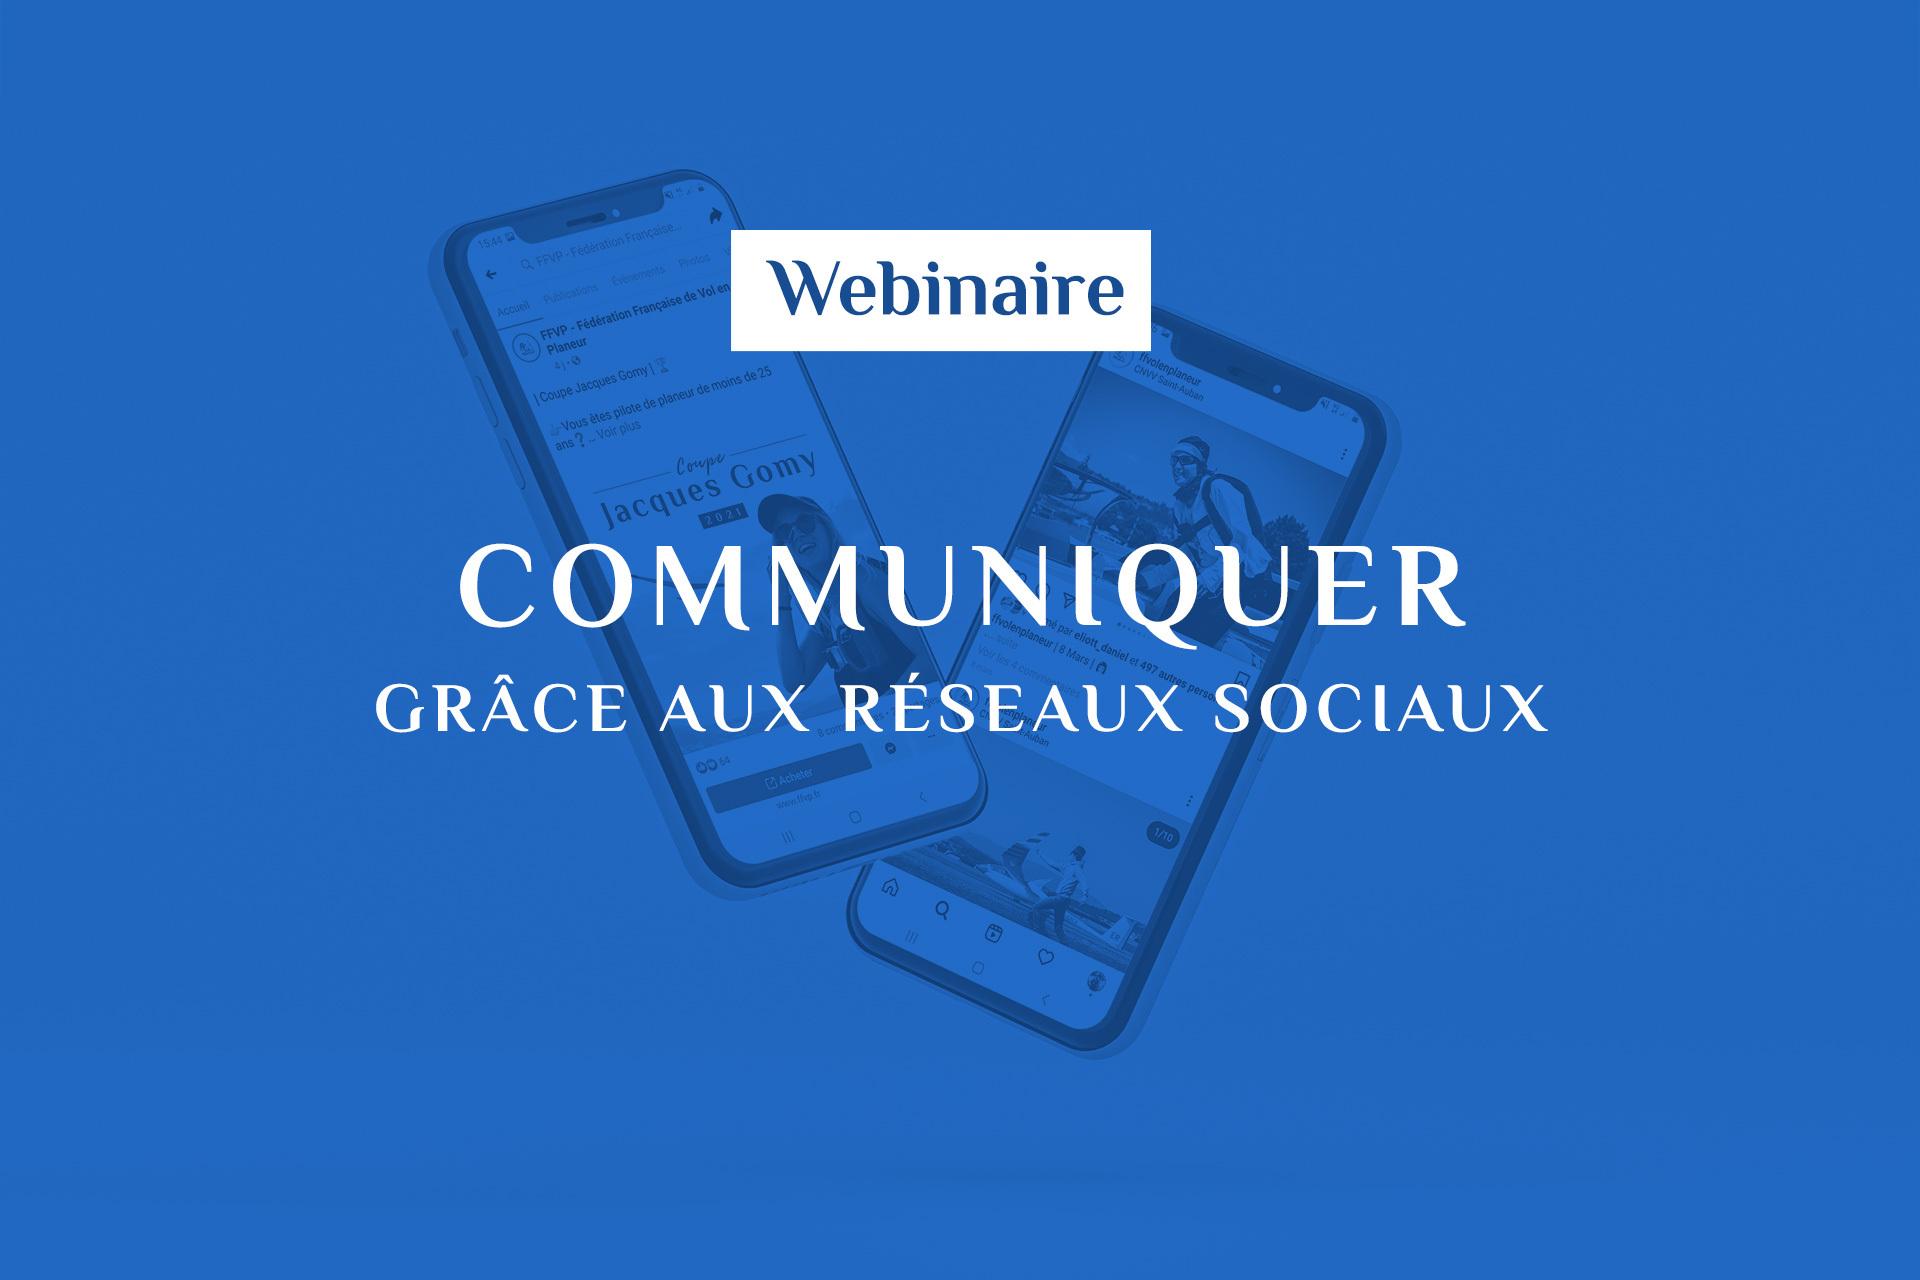 Webinaire Communication